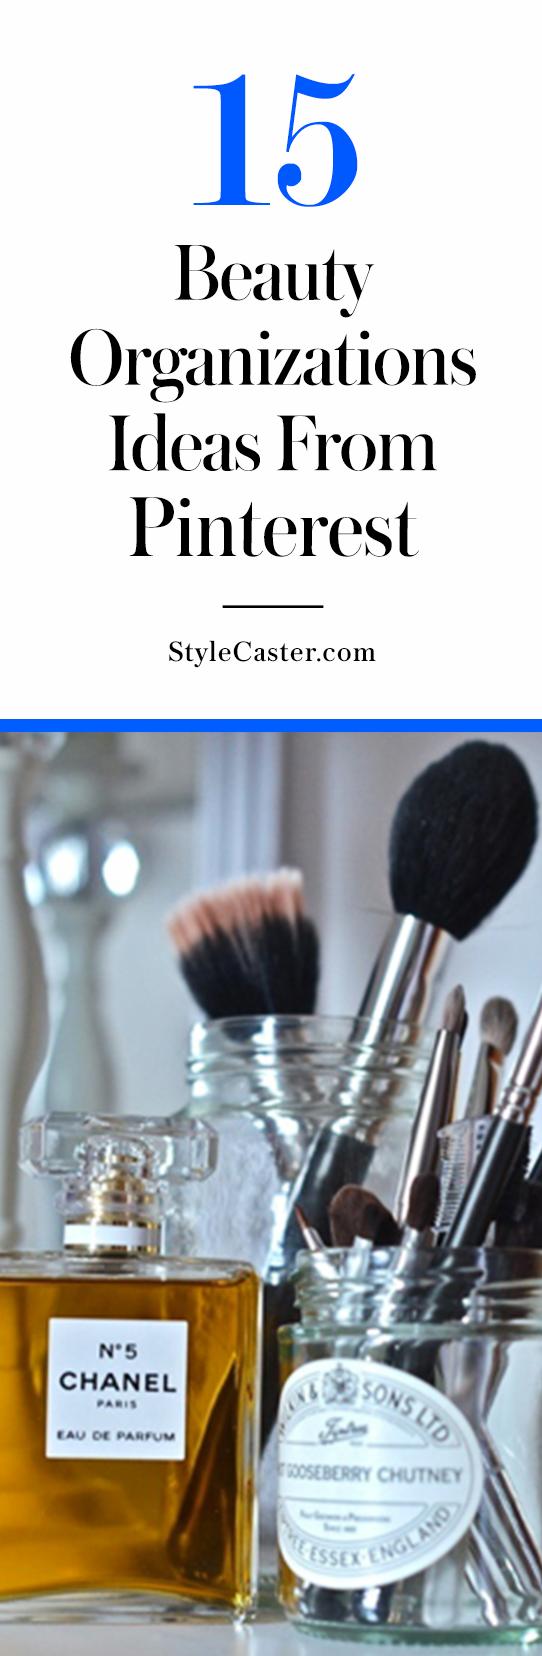 15 beauty organization ideas from Pinterest   @stylecaster